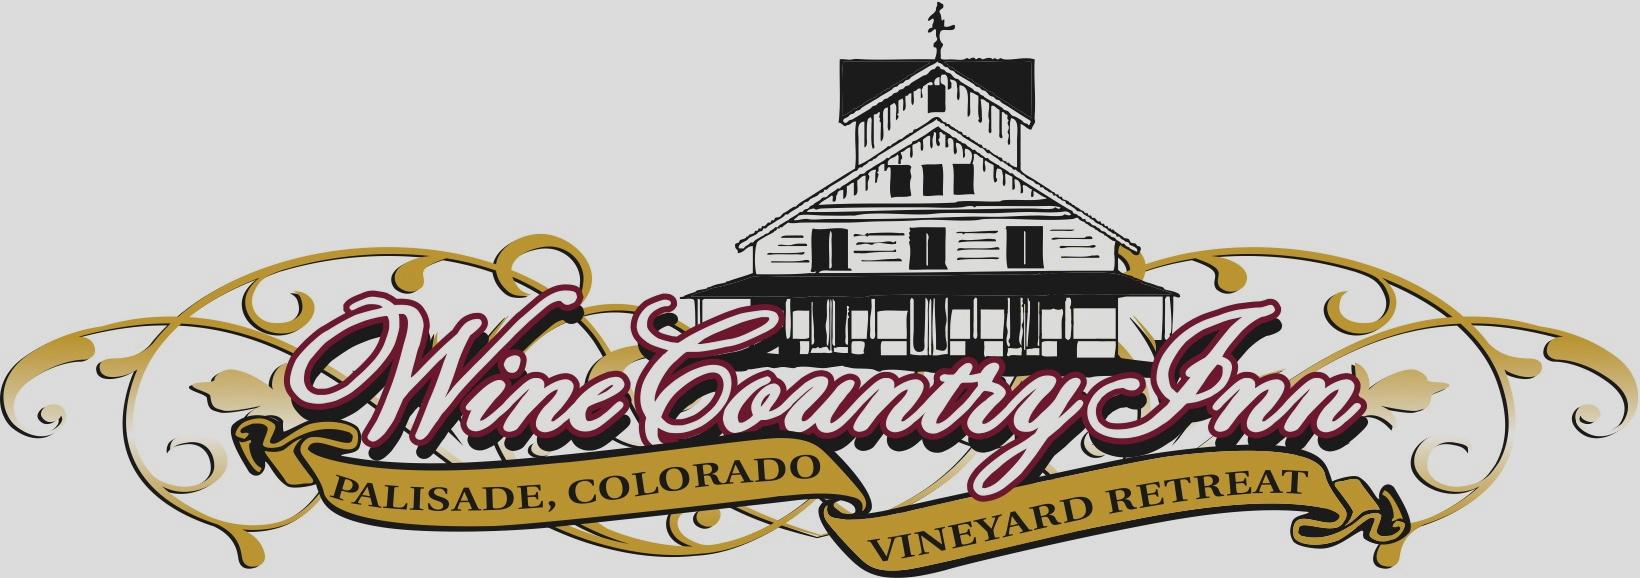 Wine Country Inn.jpg